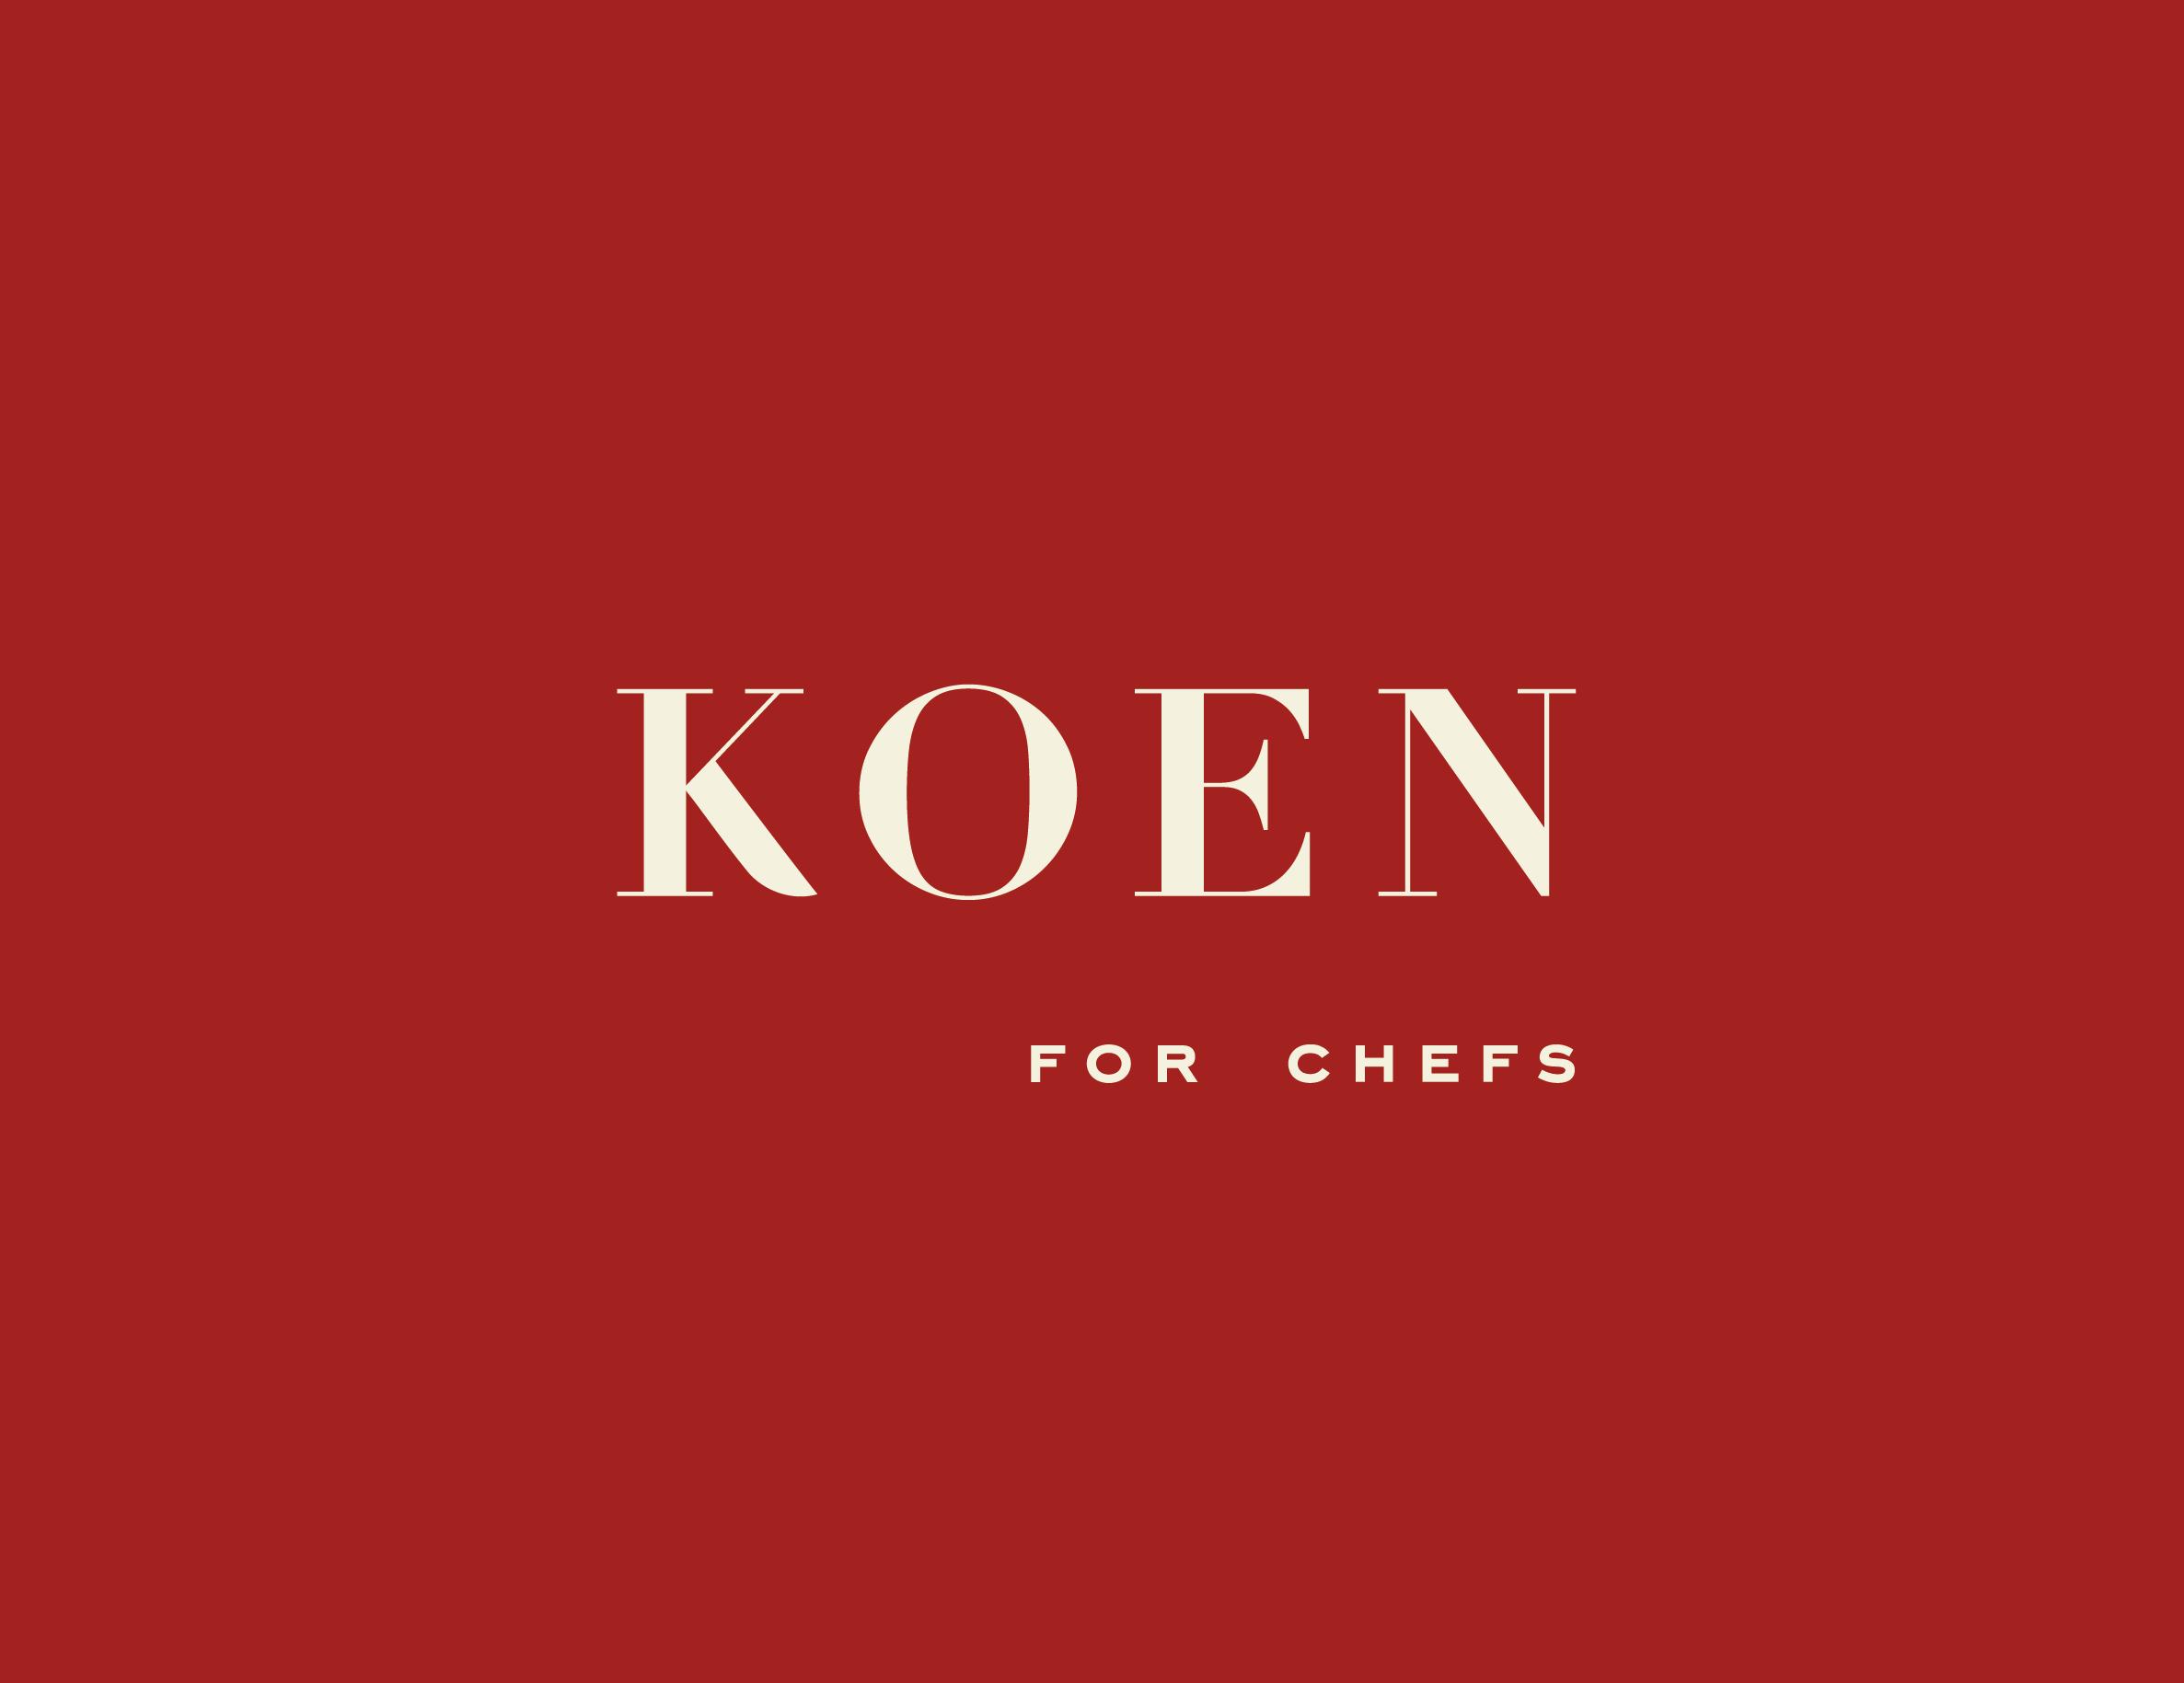 Koen for Chefs